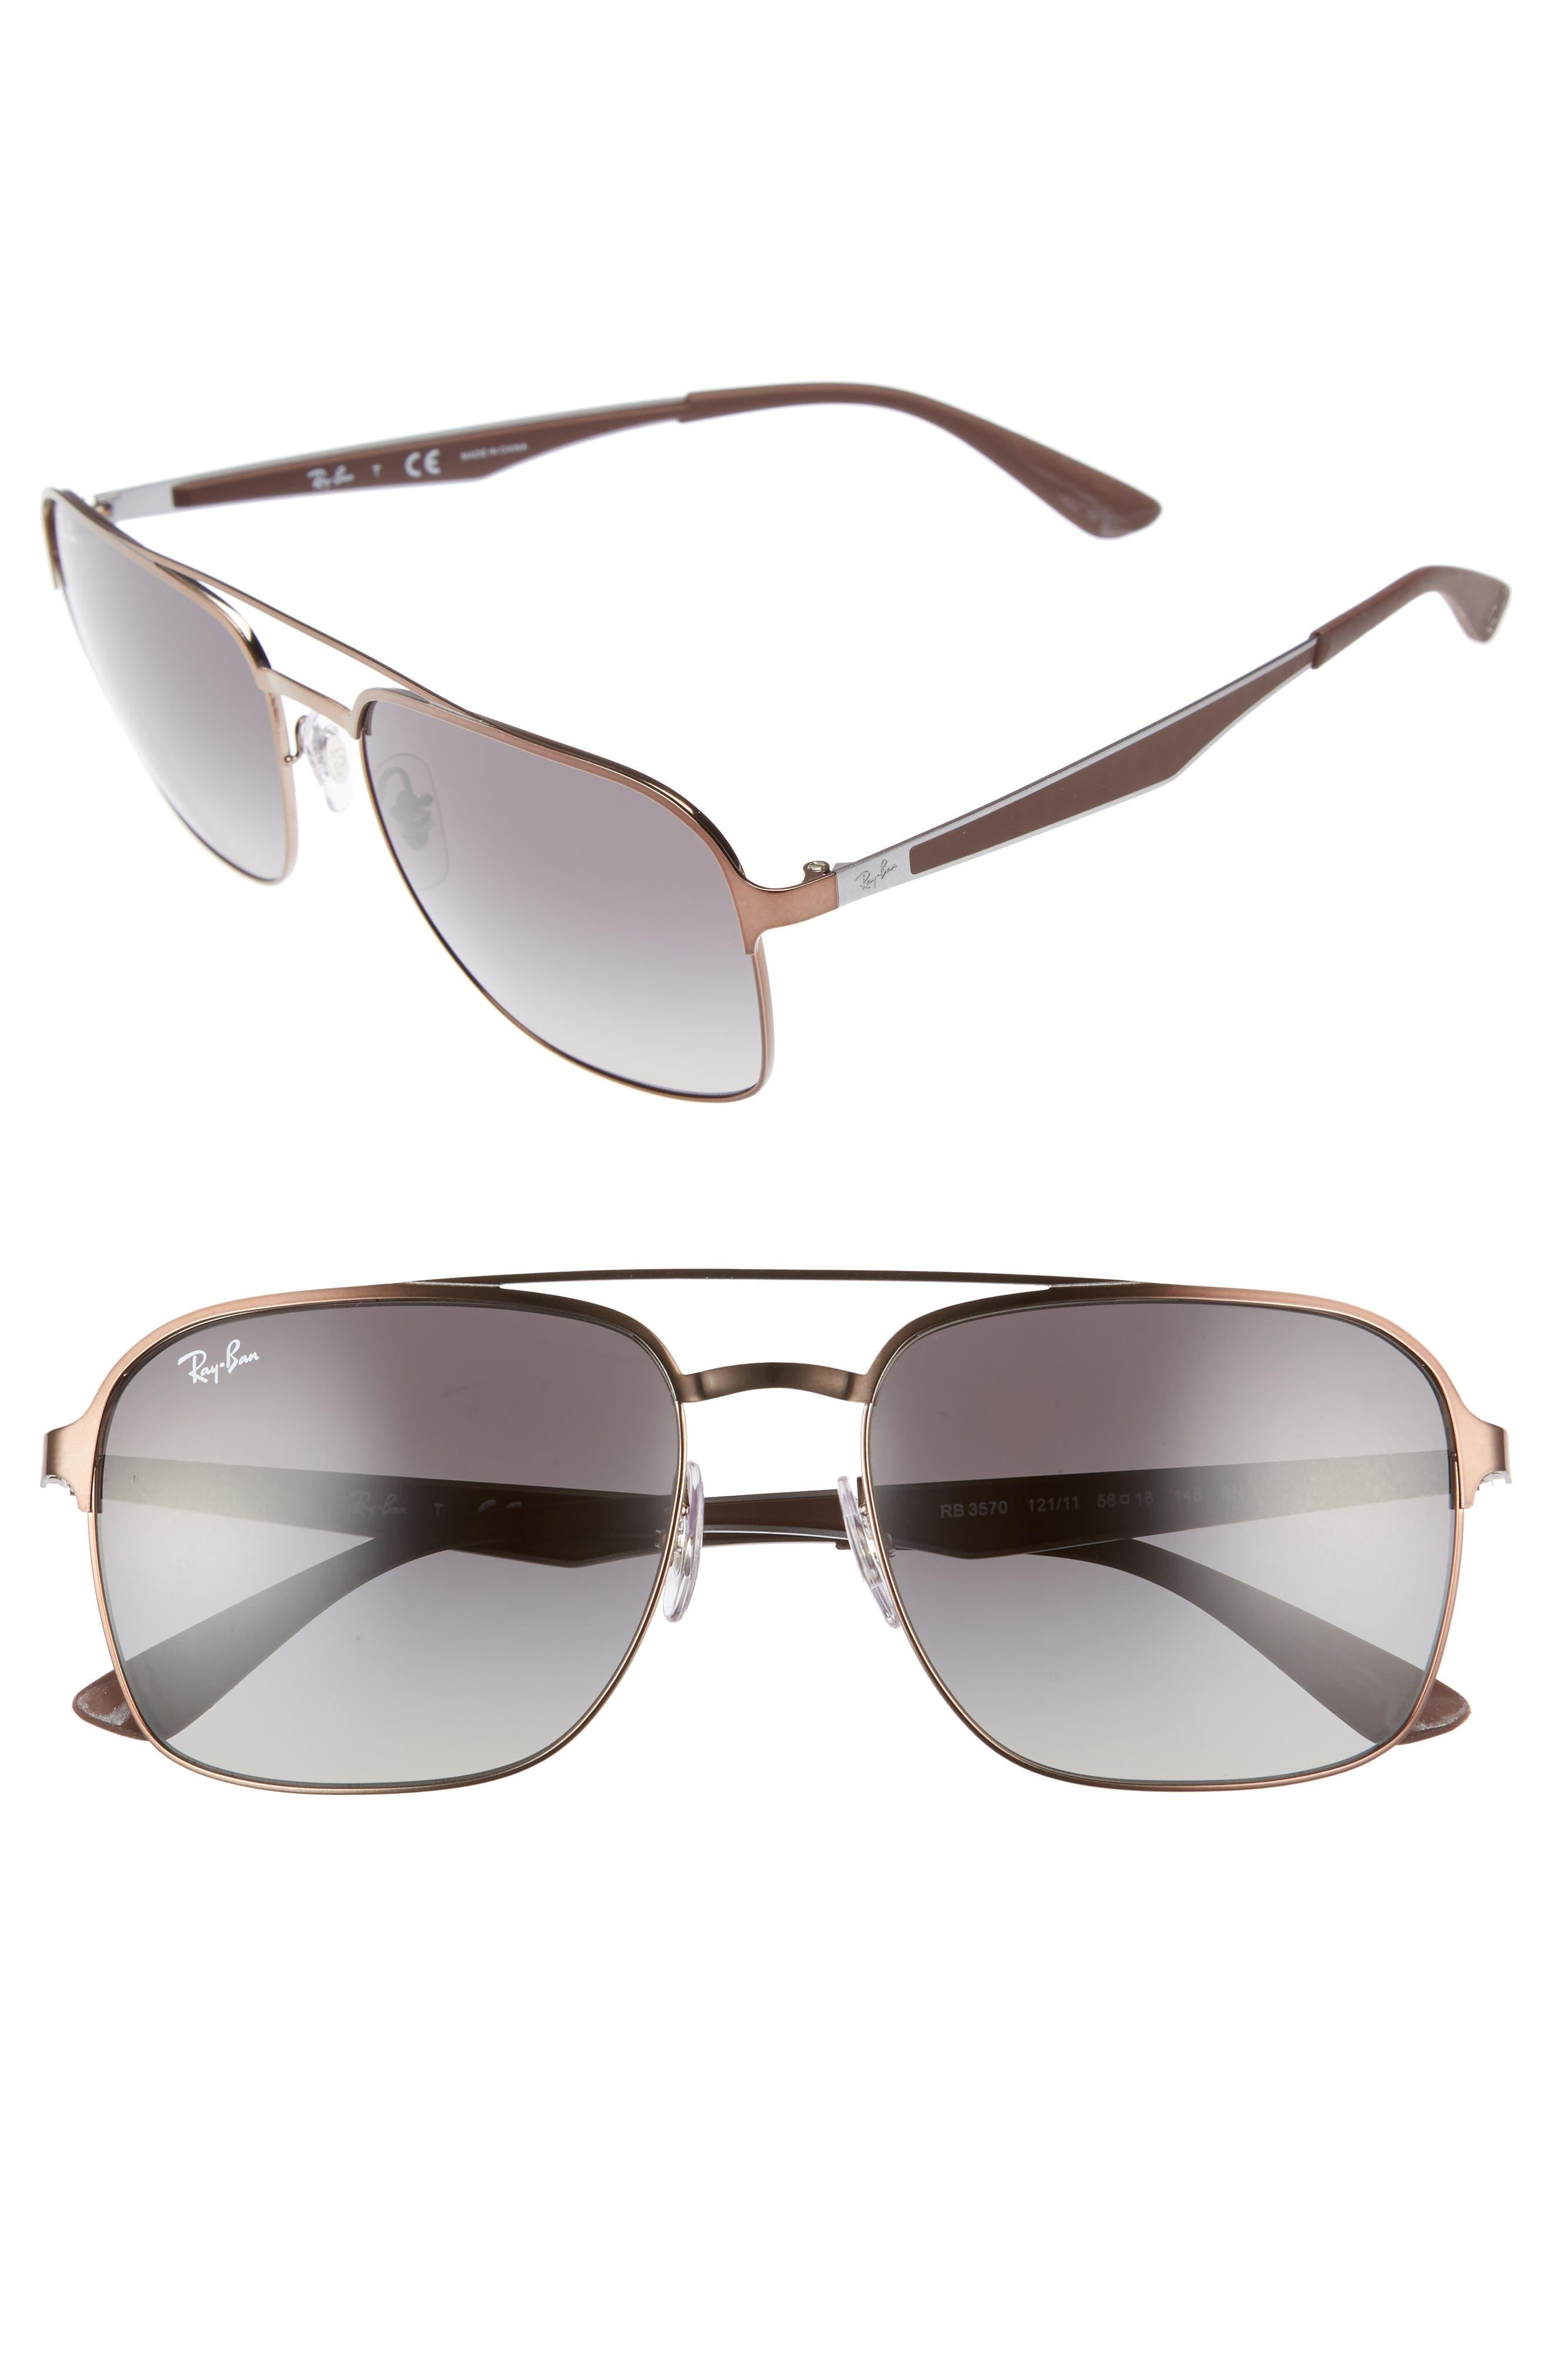 Retro 58mm Sunglasses,                             Main thumbnail 1, color,                             Brown